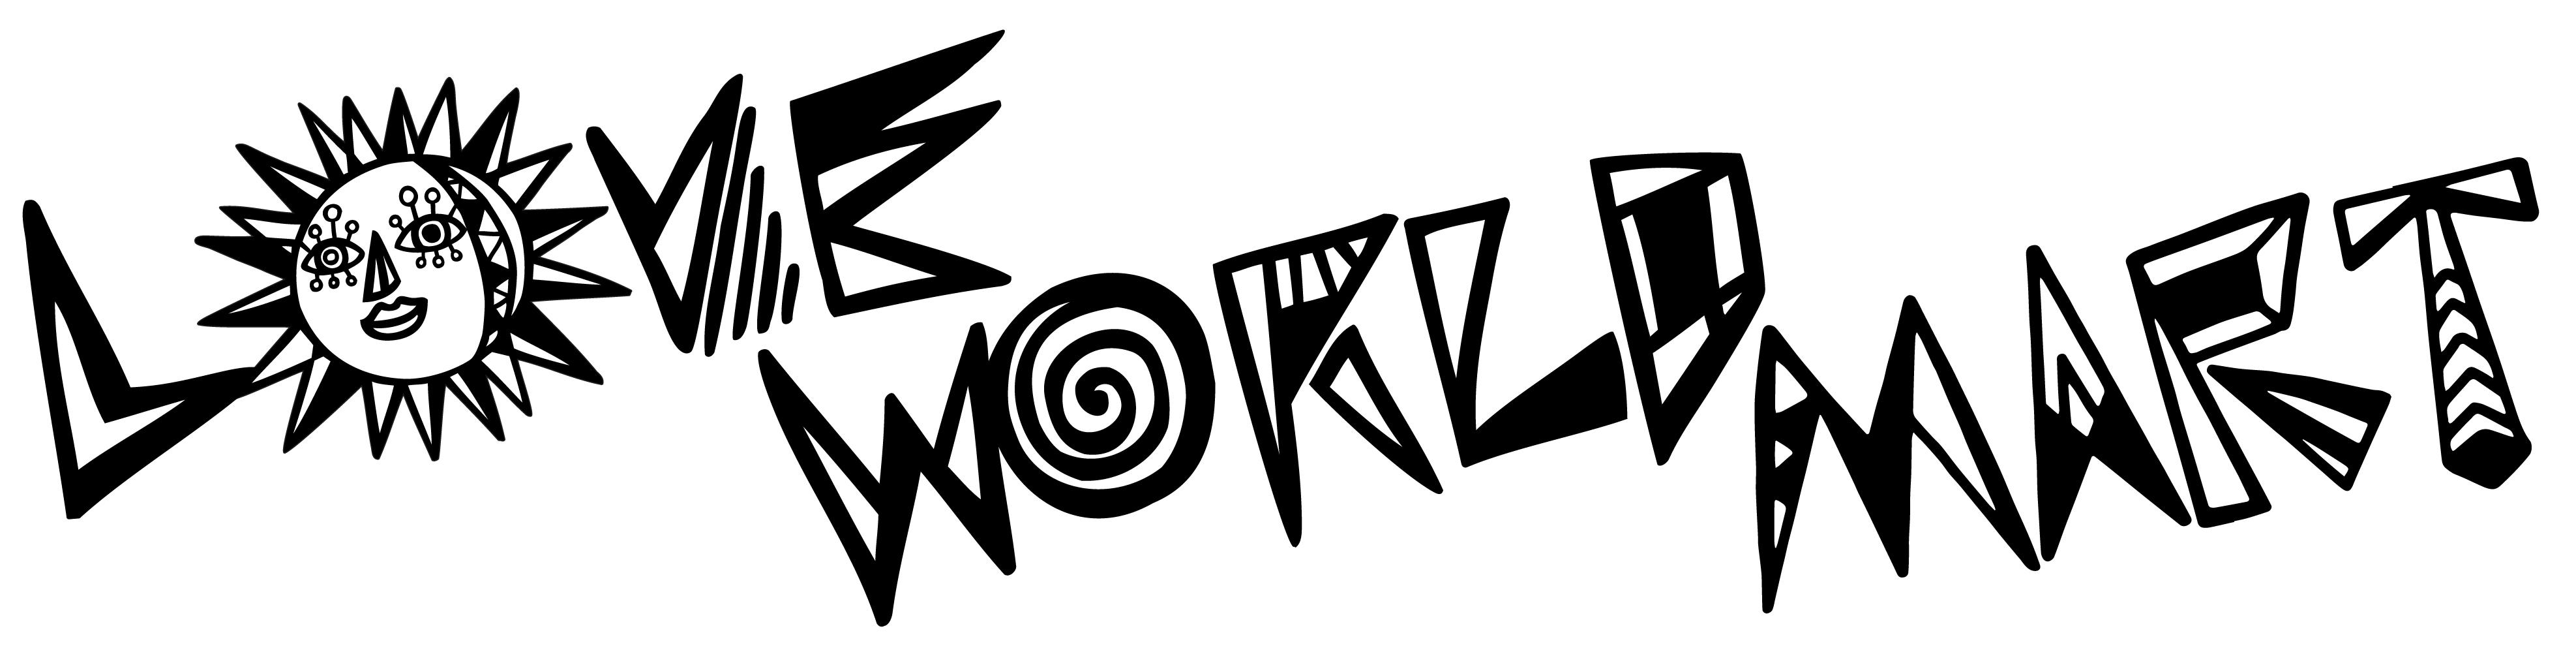 LOVE WORLD MART